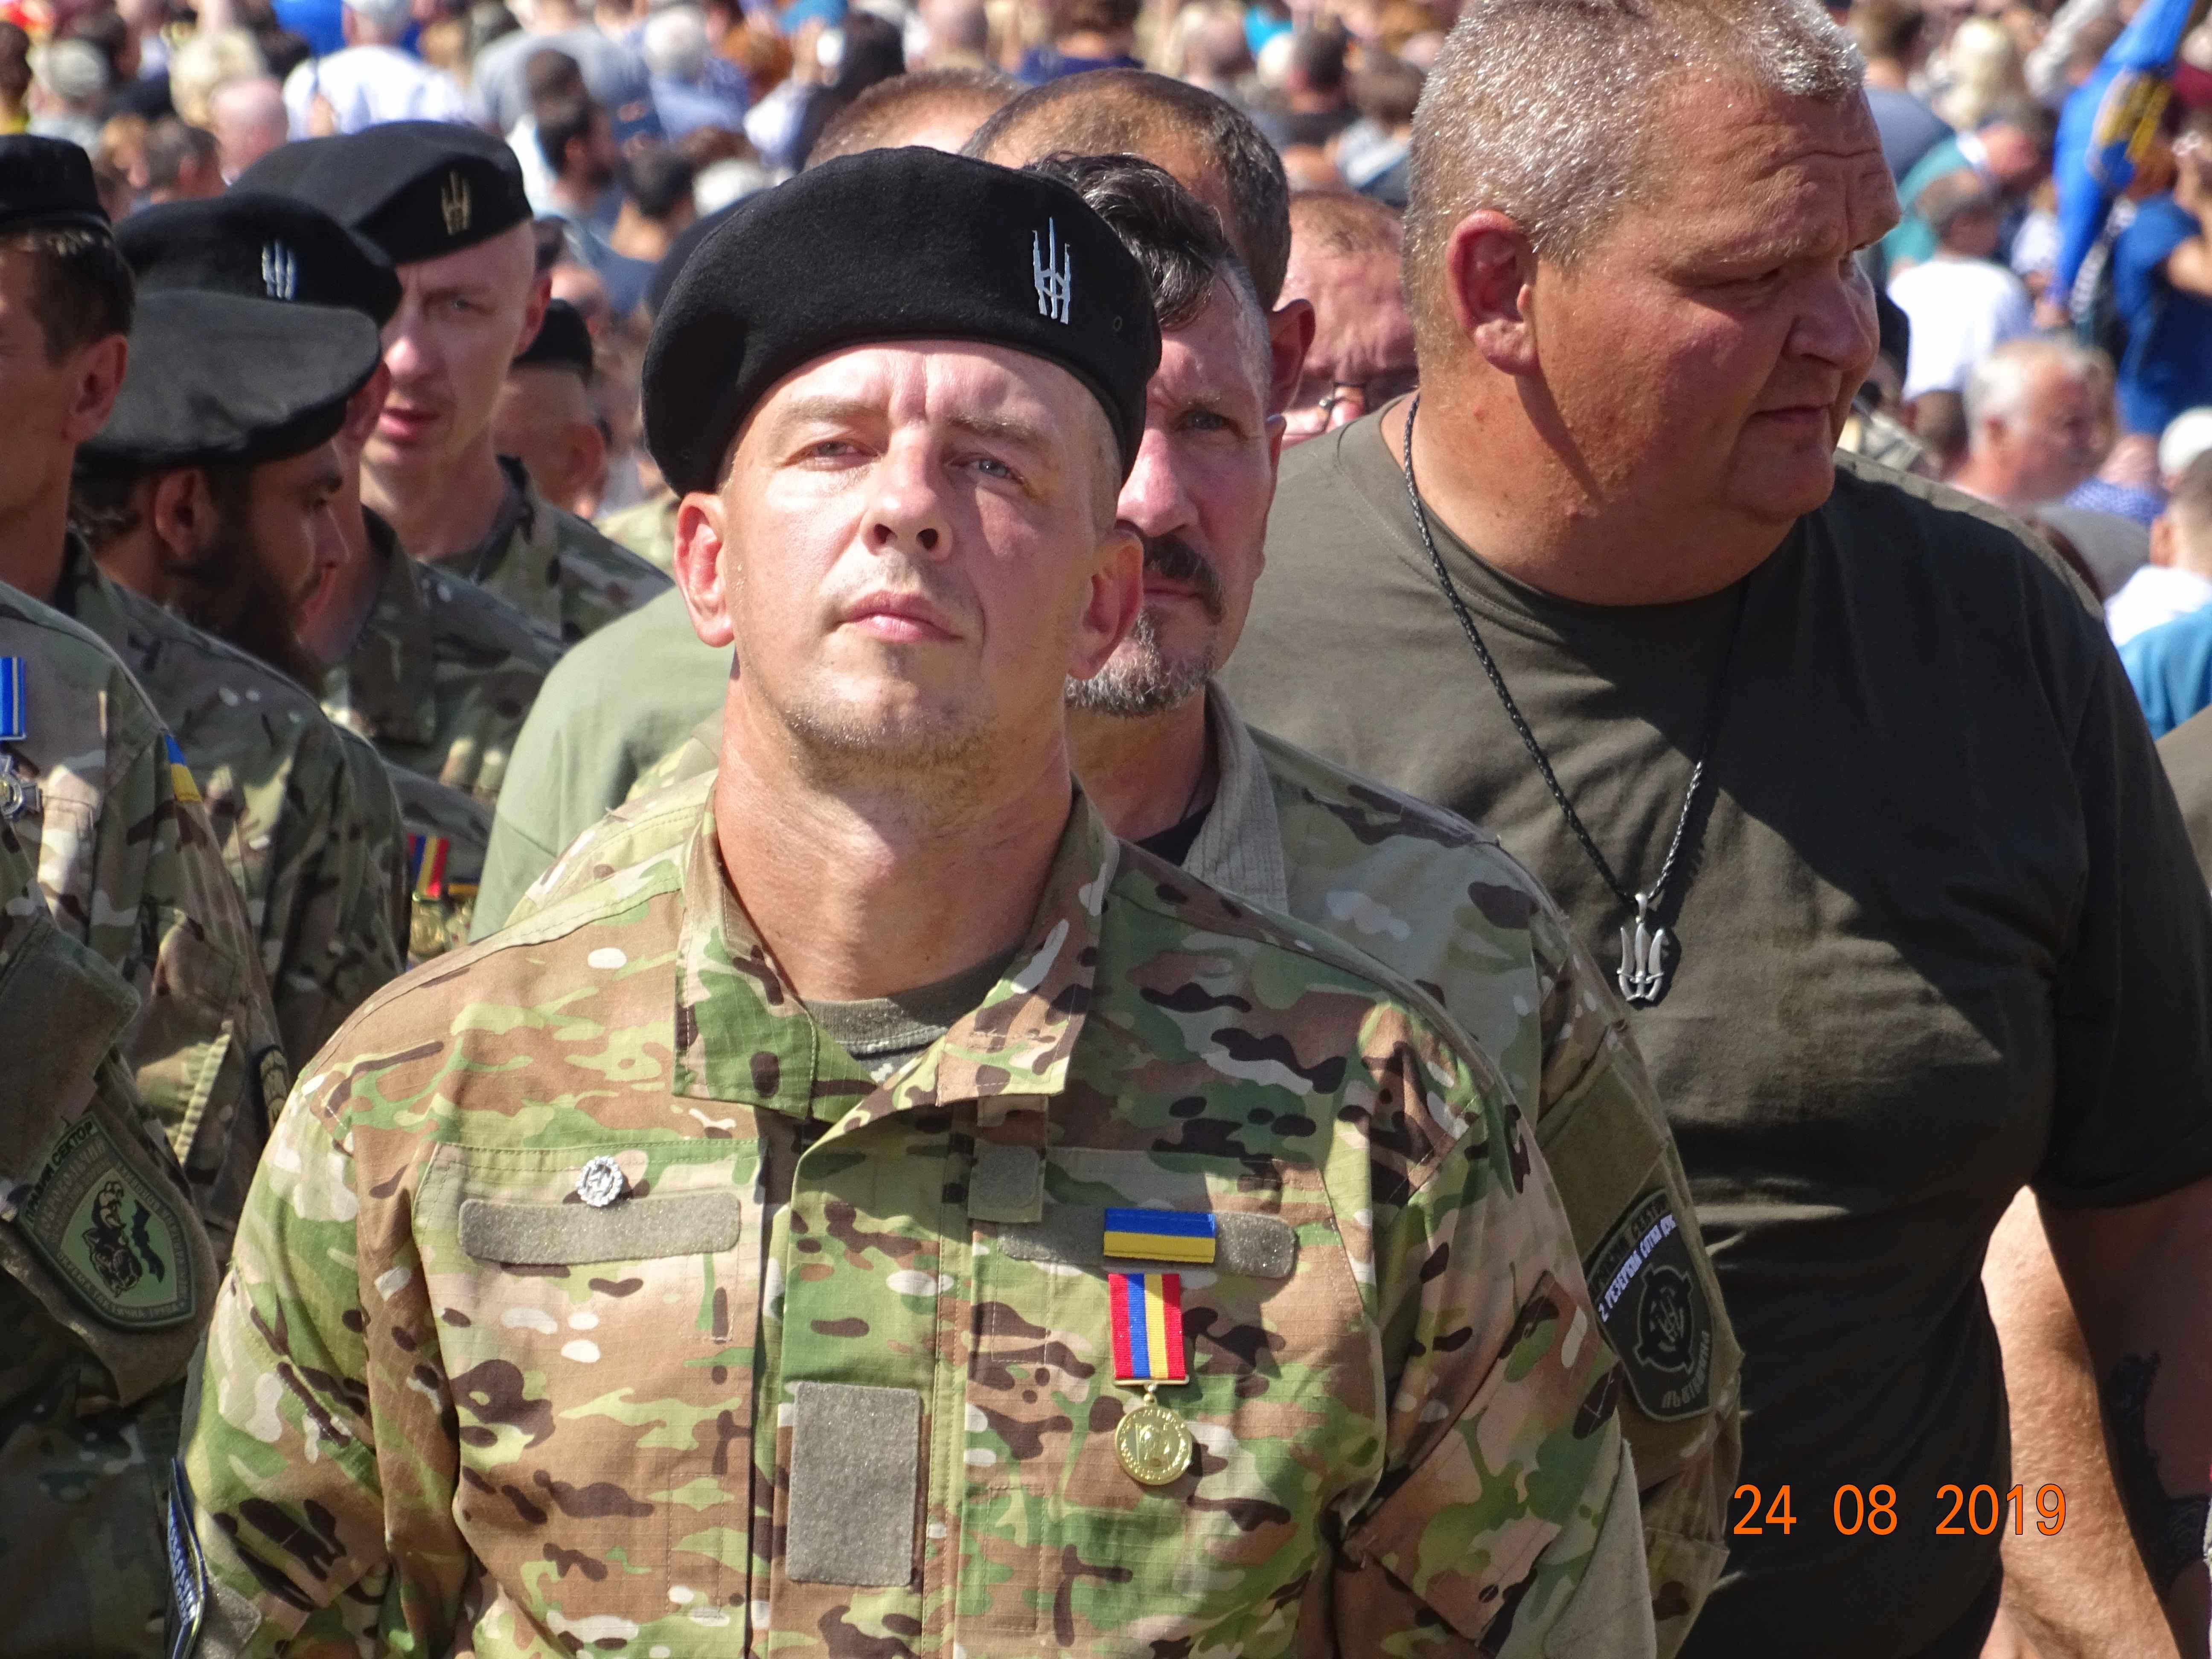 Defenders-of-Ukraine-Parad-24.Aug.19 - DSC06374.jpg